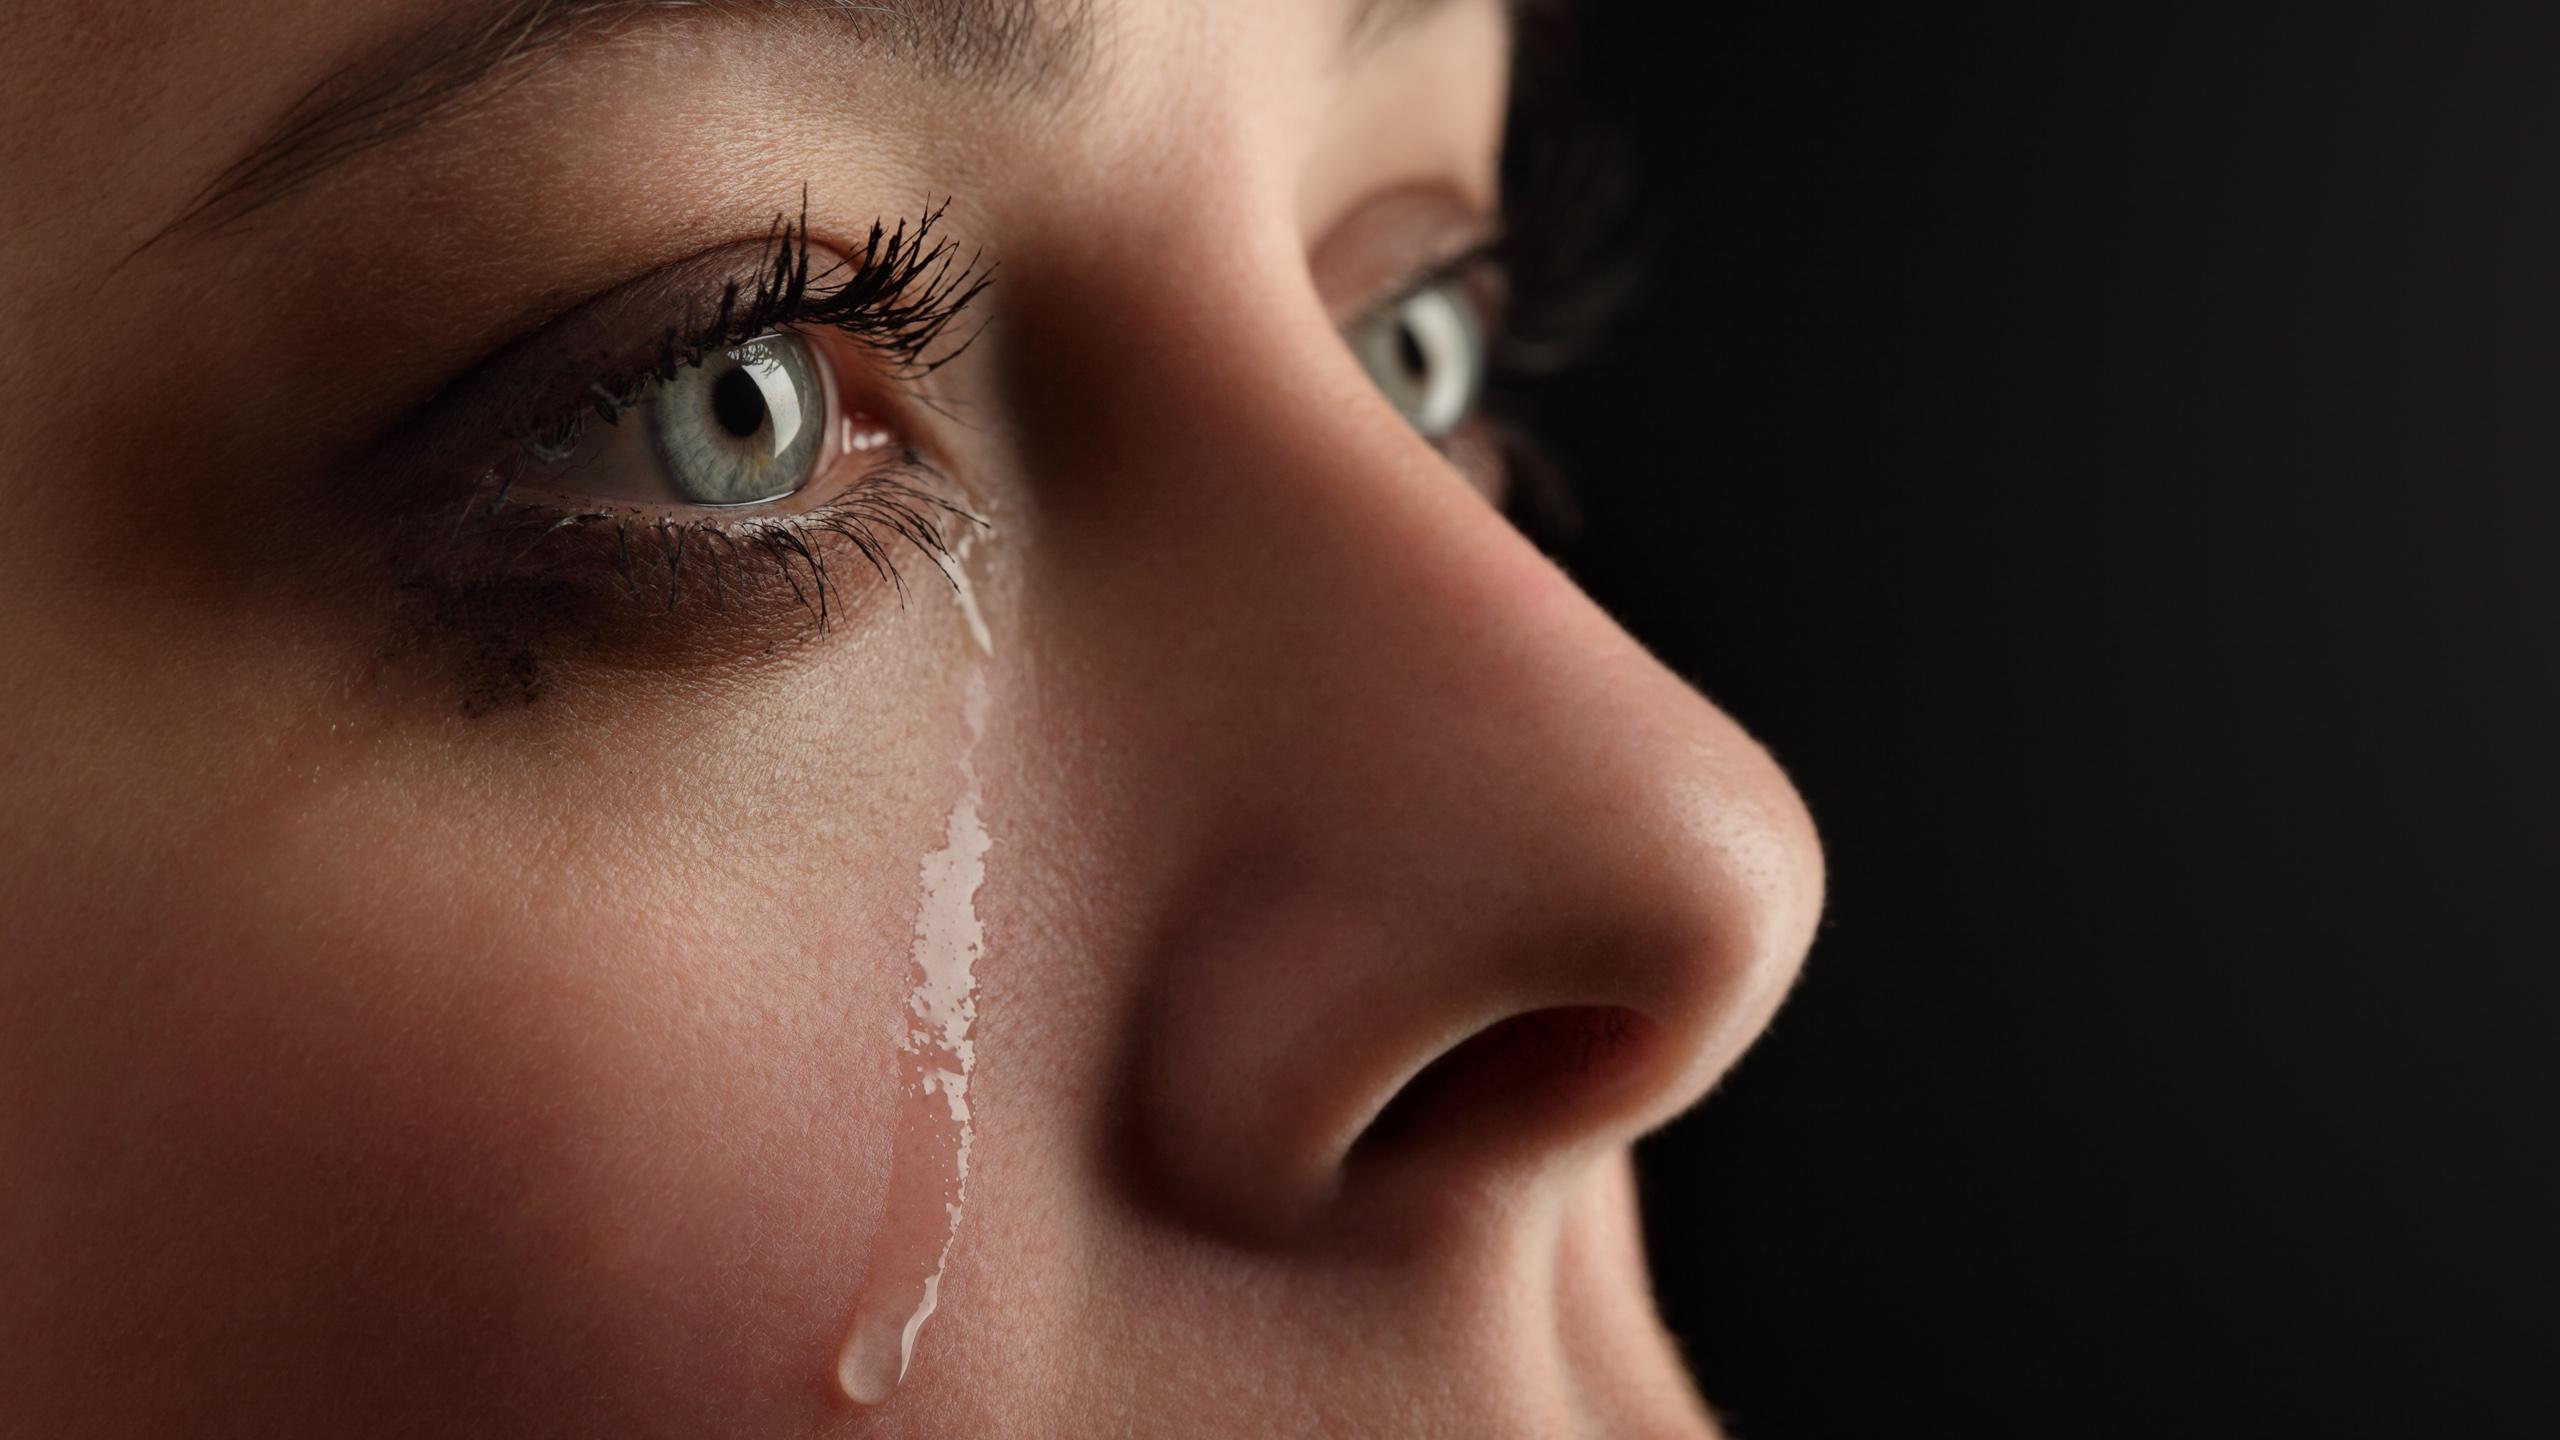 Feeling Sad? Let the Tears Flow